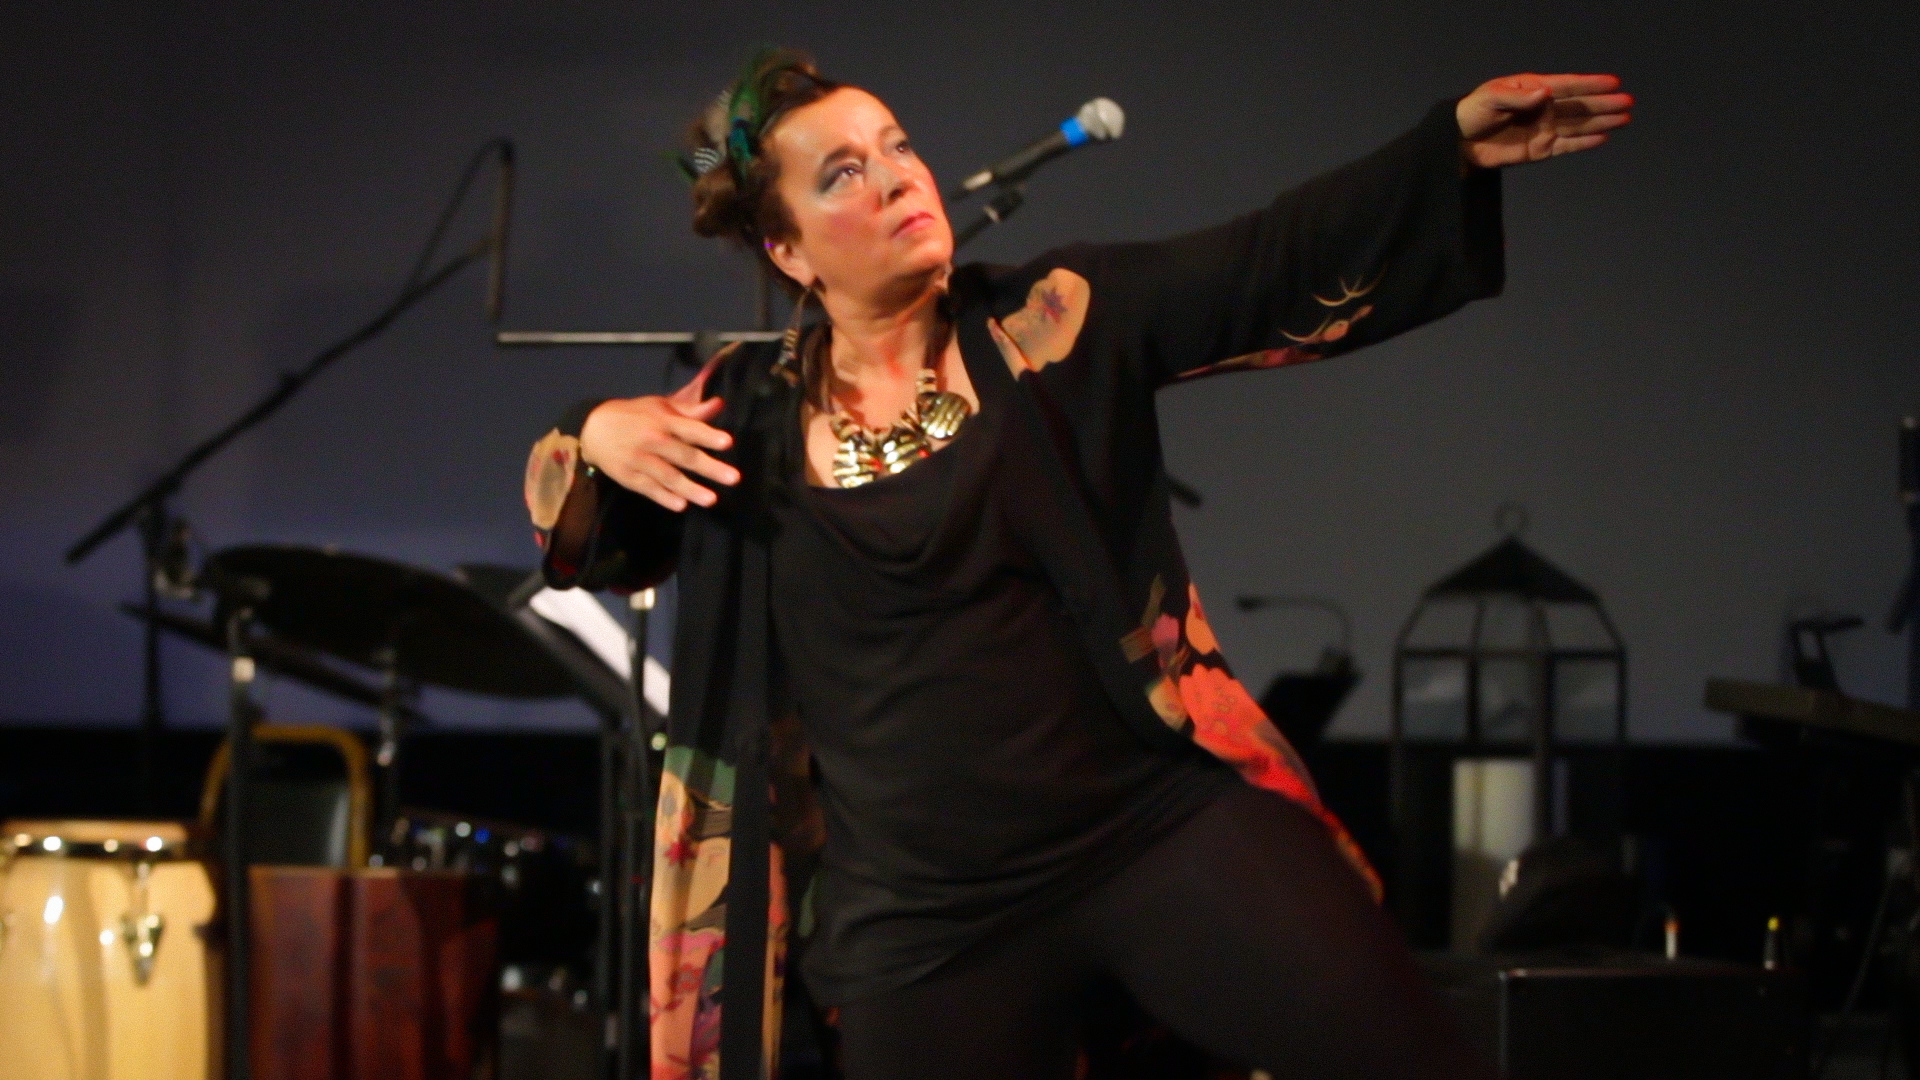 Denise cello dance 1.png